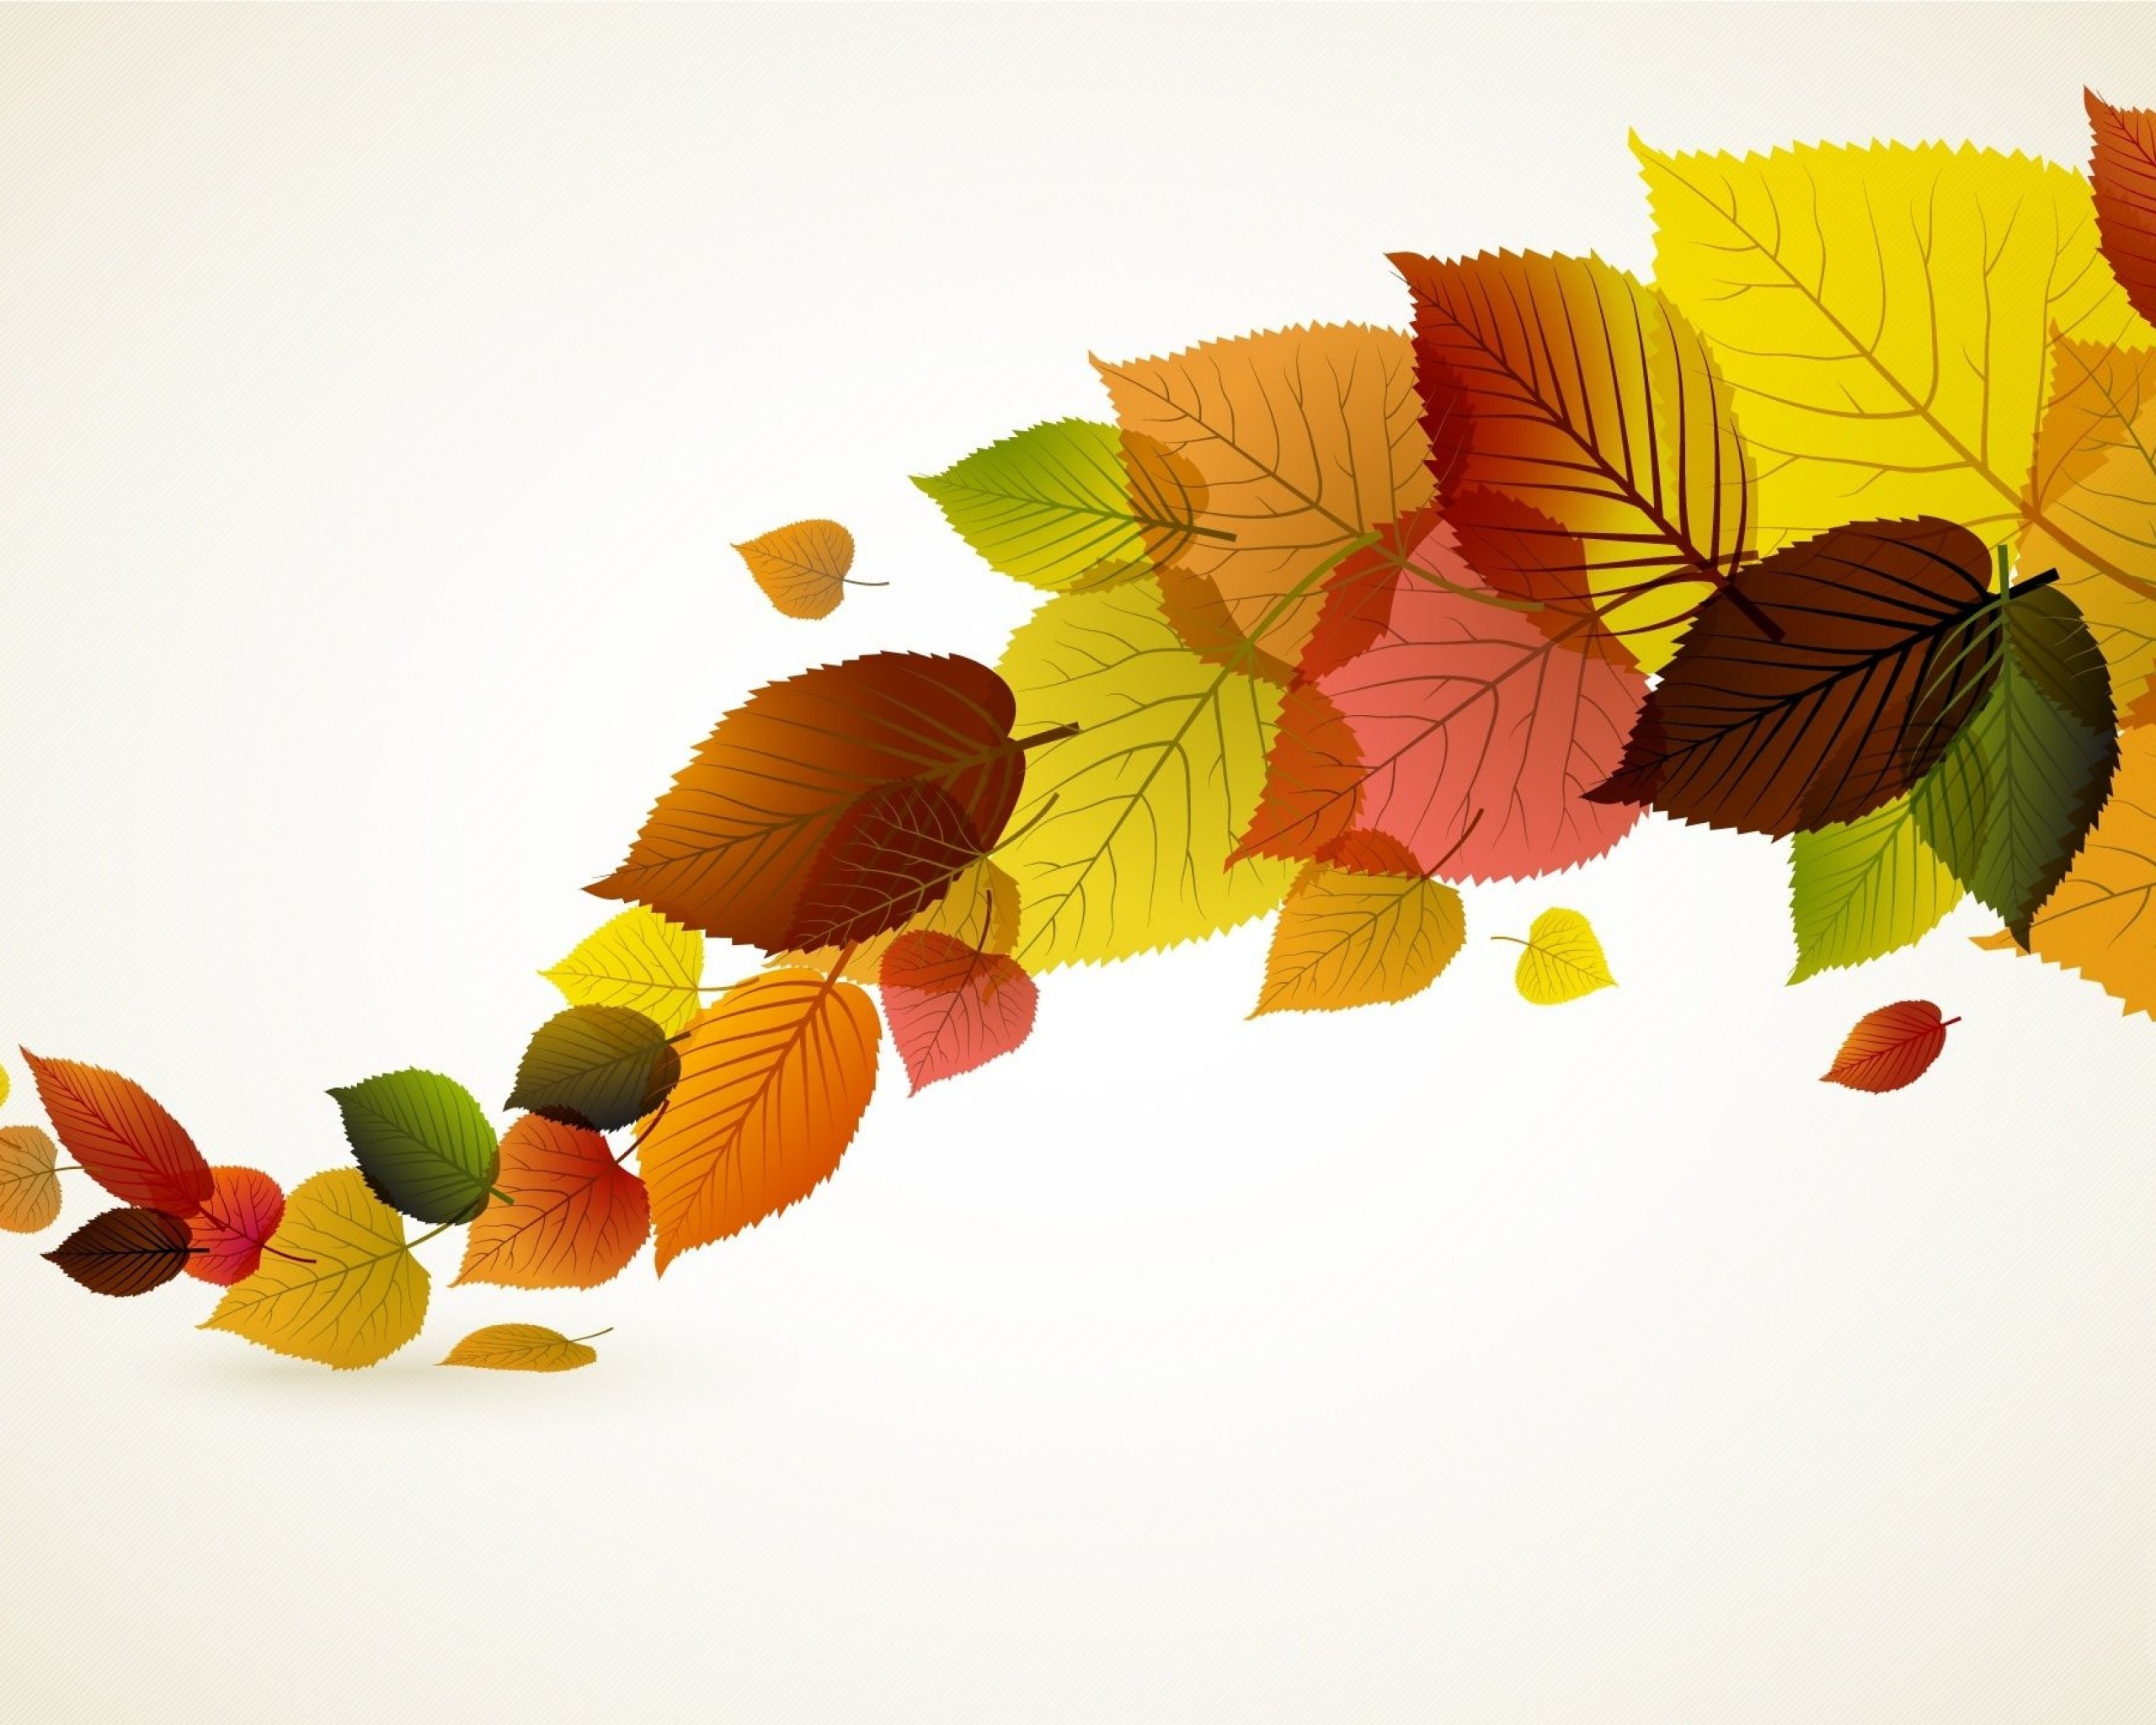 Autumn Leaves Illustration Desktop Wallpaper Uploaded by 10Mantra